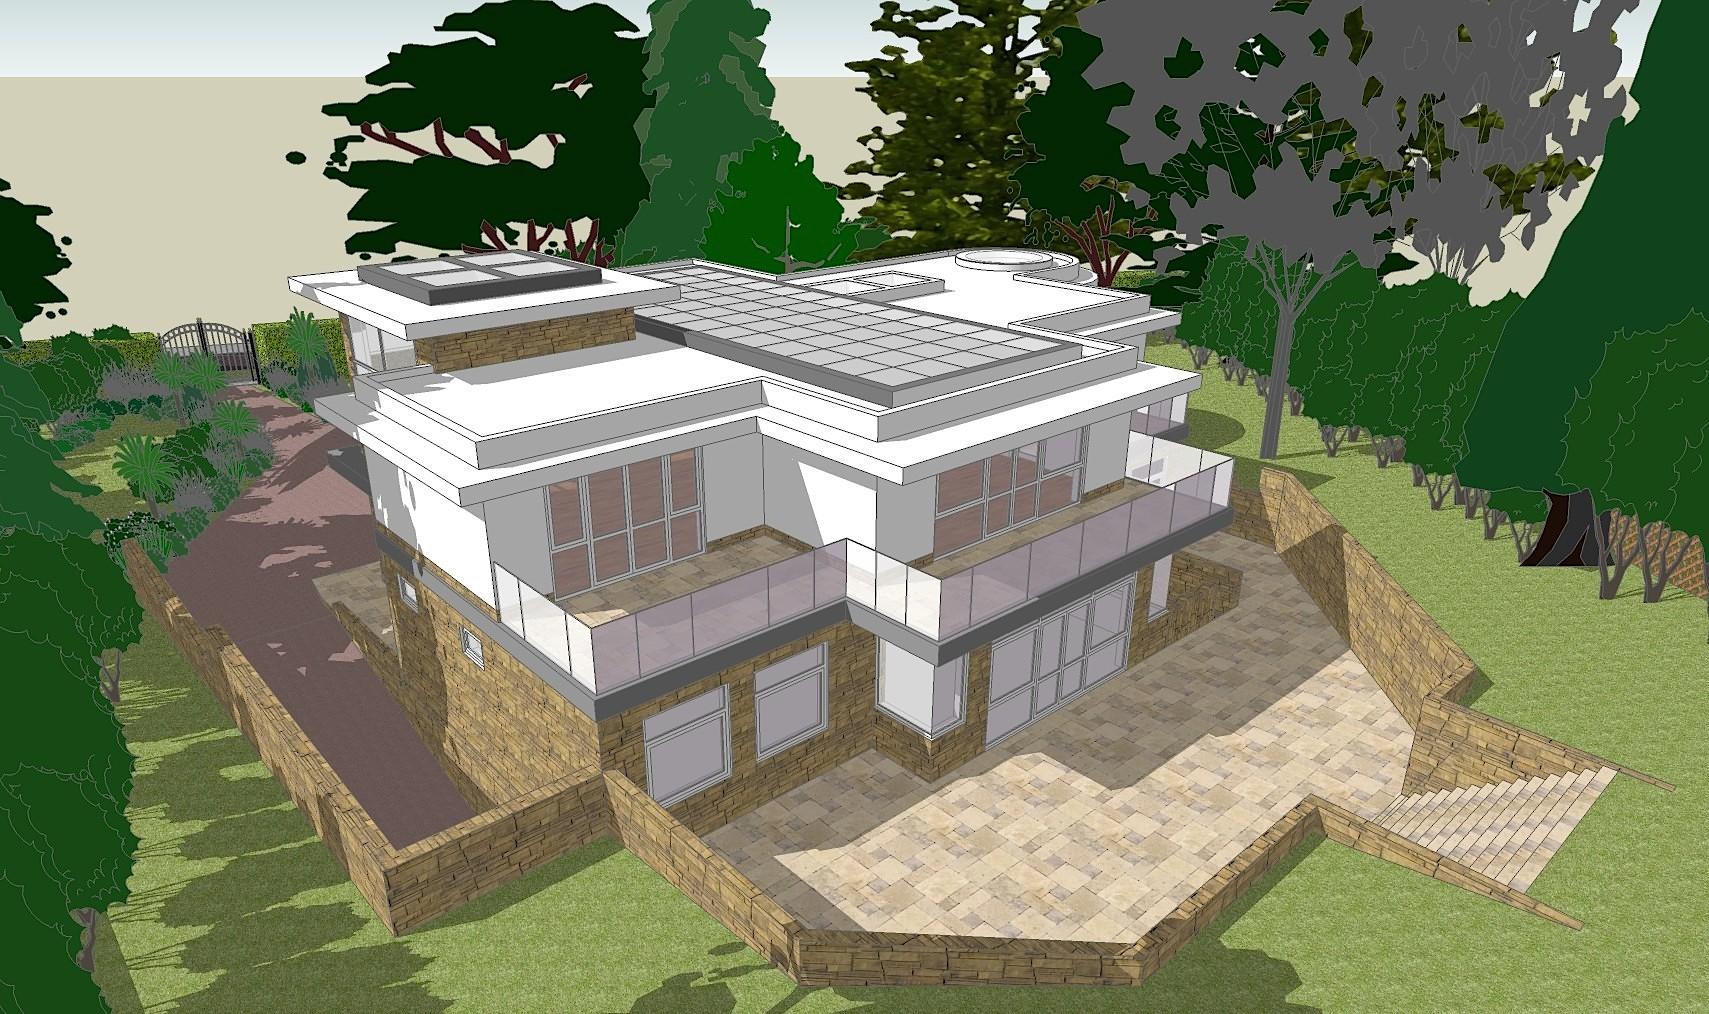 Bury Rd 3D visualisation 2.jpg